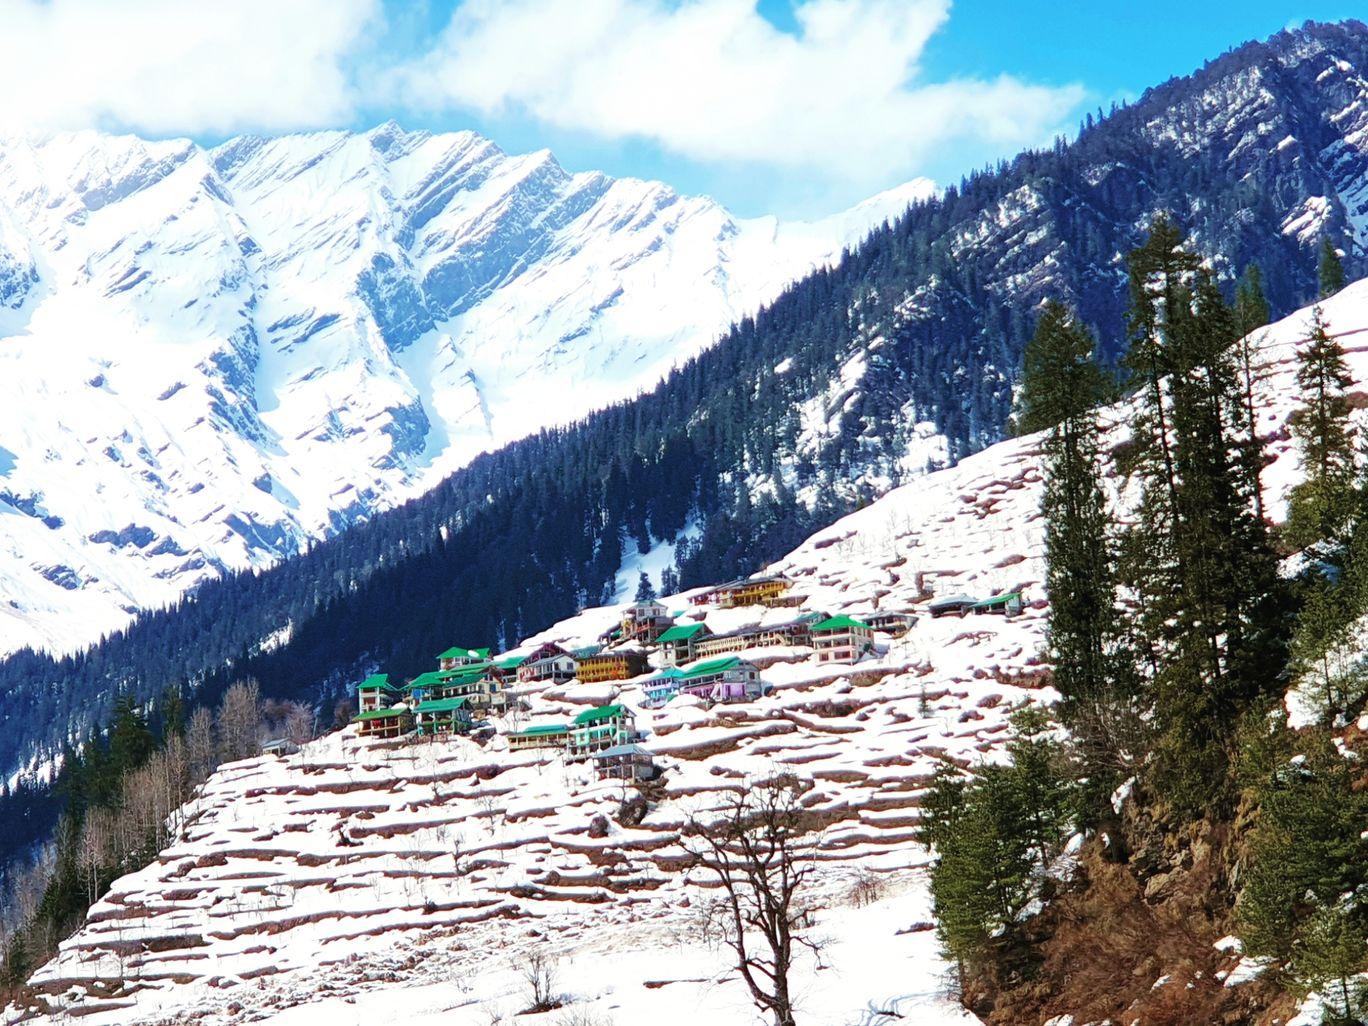 Photo of Manali By akash chaudhary